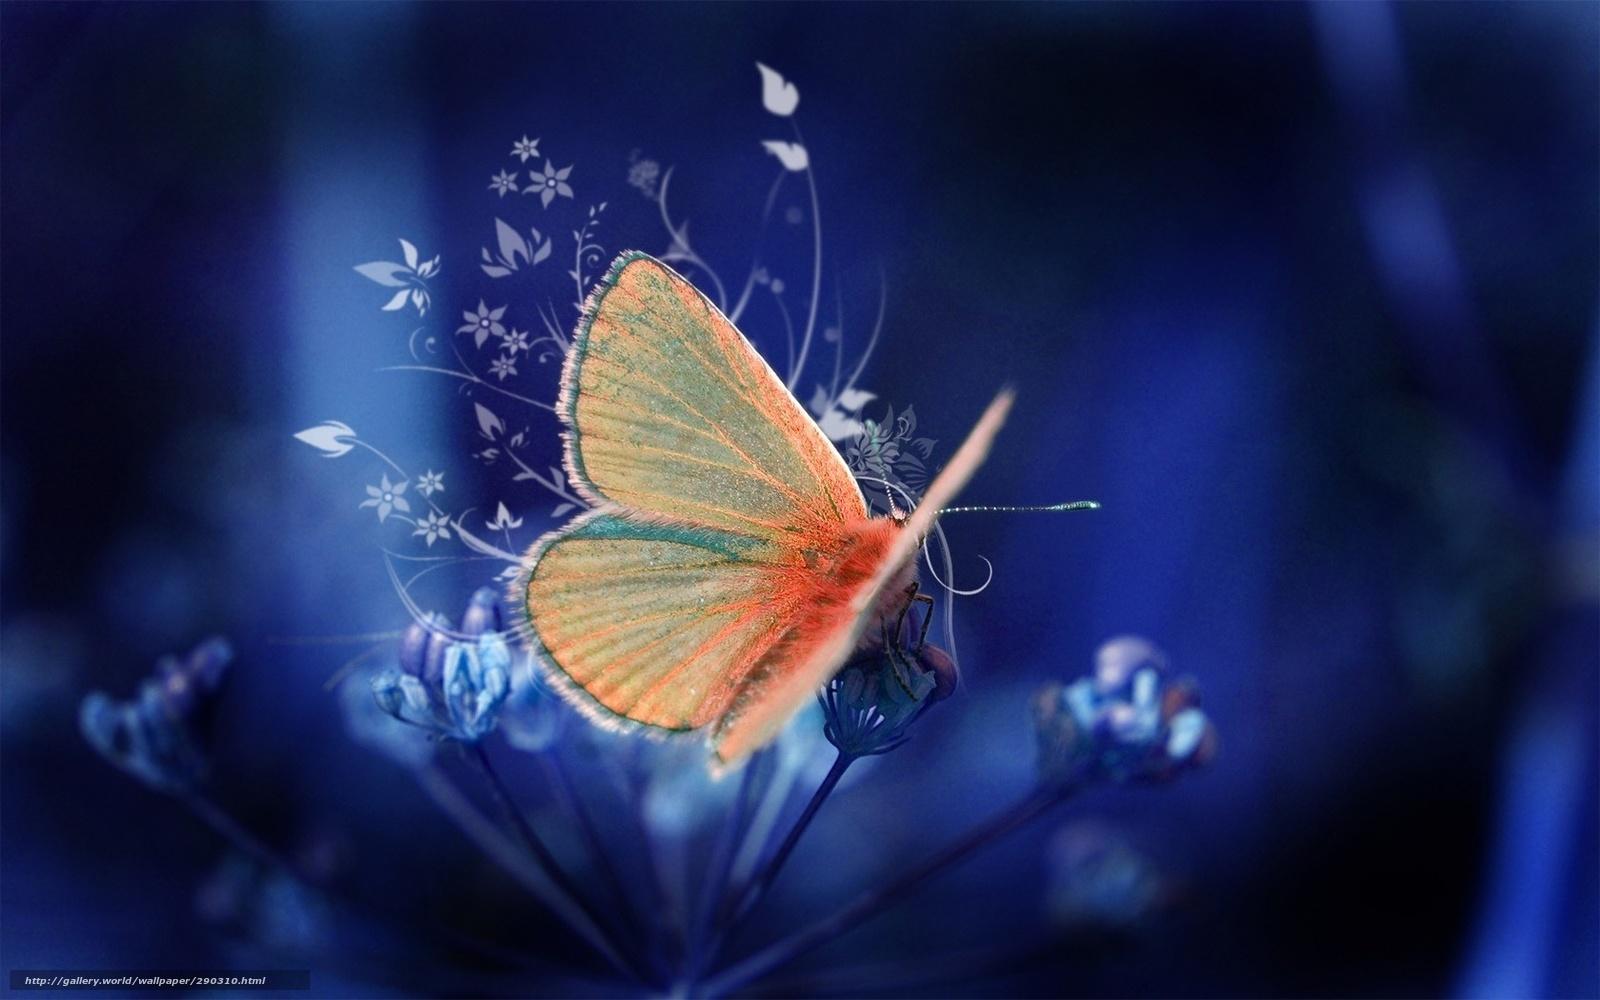 Hq kelebek arka plan renk 1680x1050 resim rendering